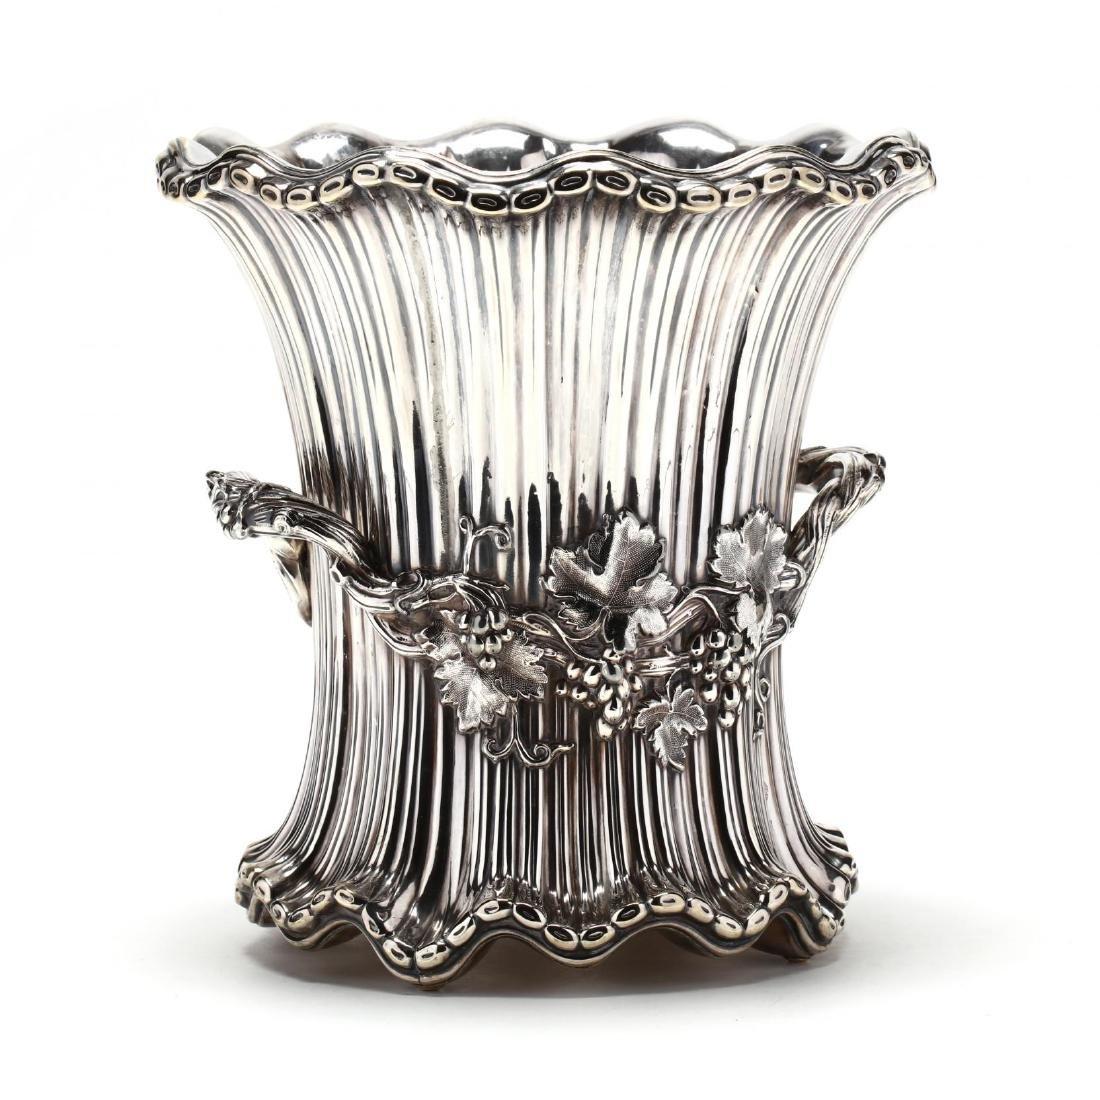 A Very Fine William IV Silverplate Wine Cooler